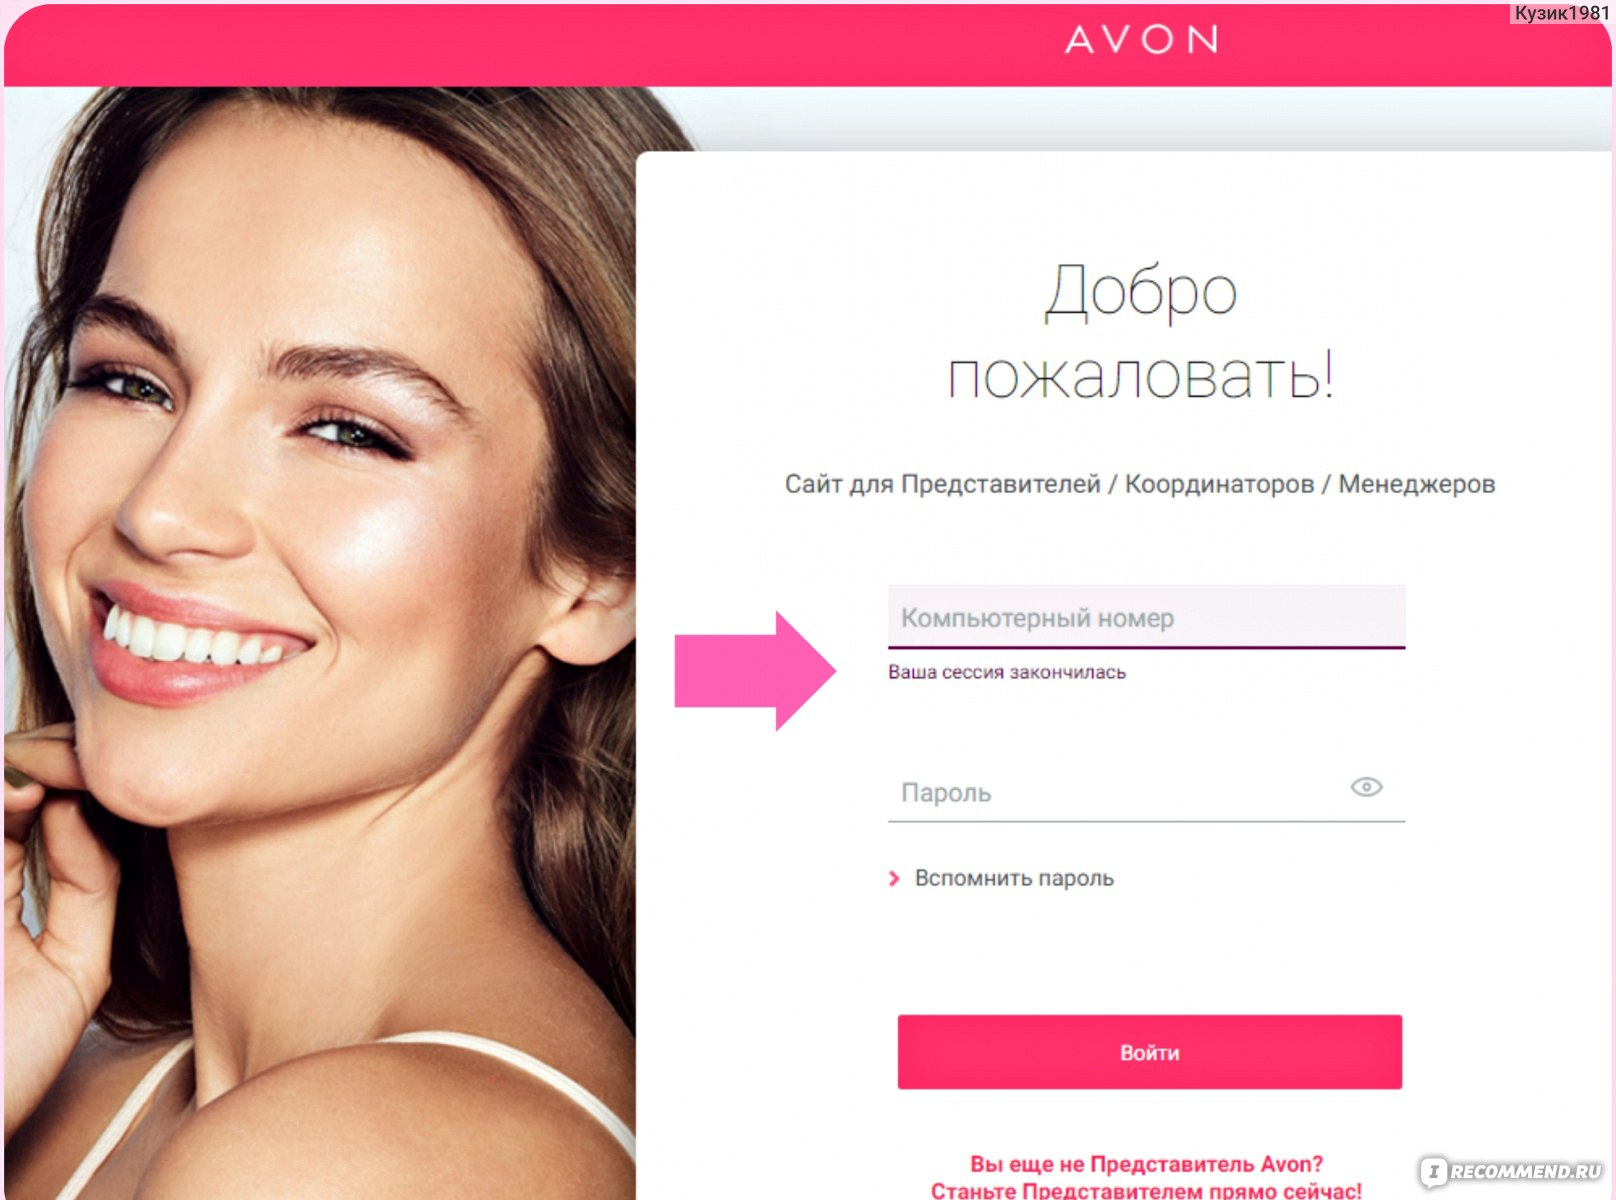 Avon ru моя страница косметика линда купить